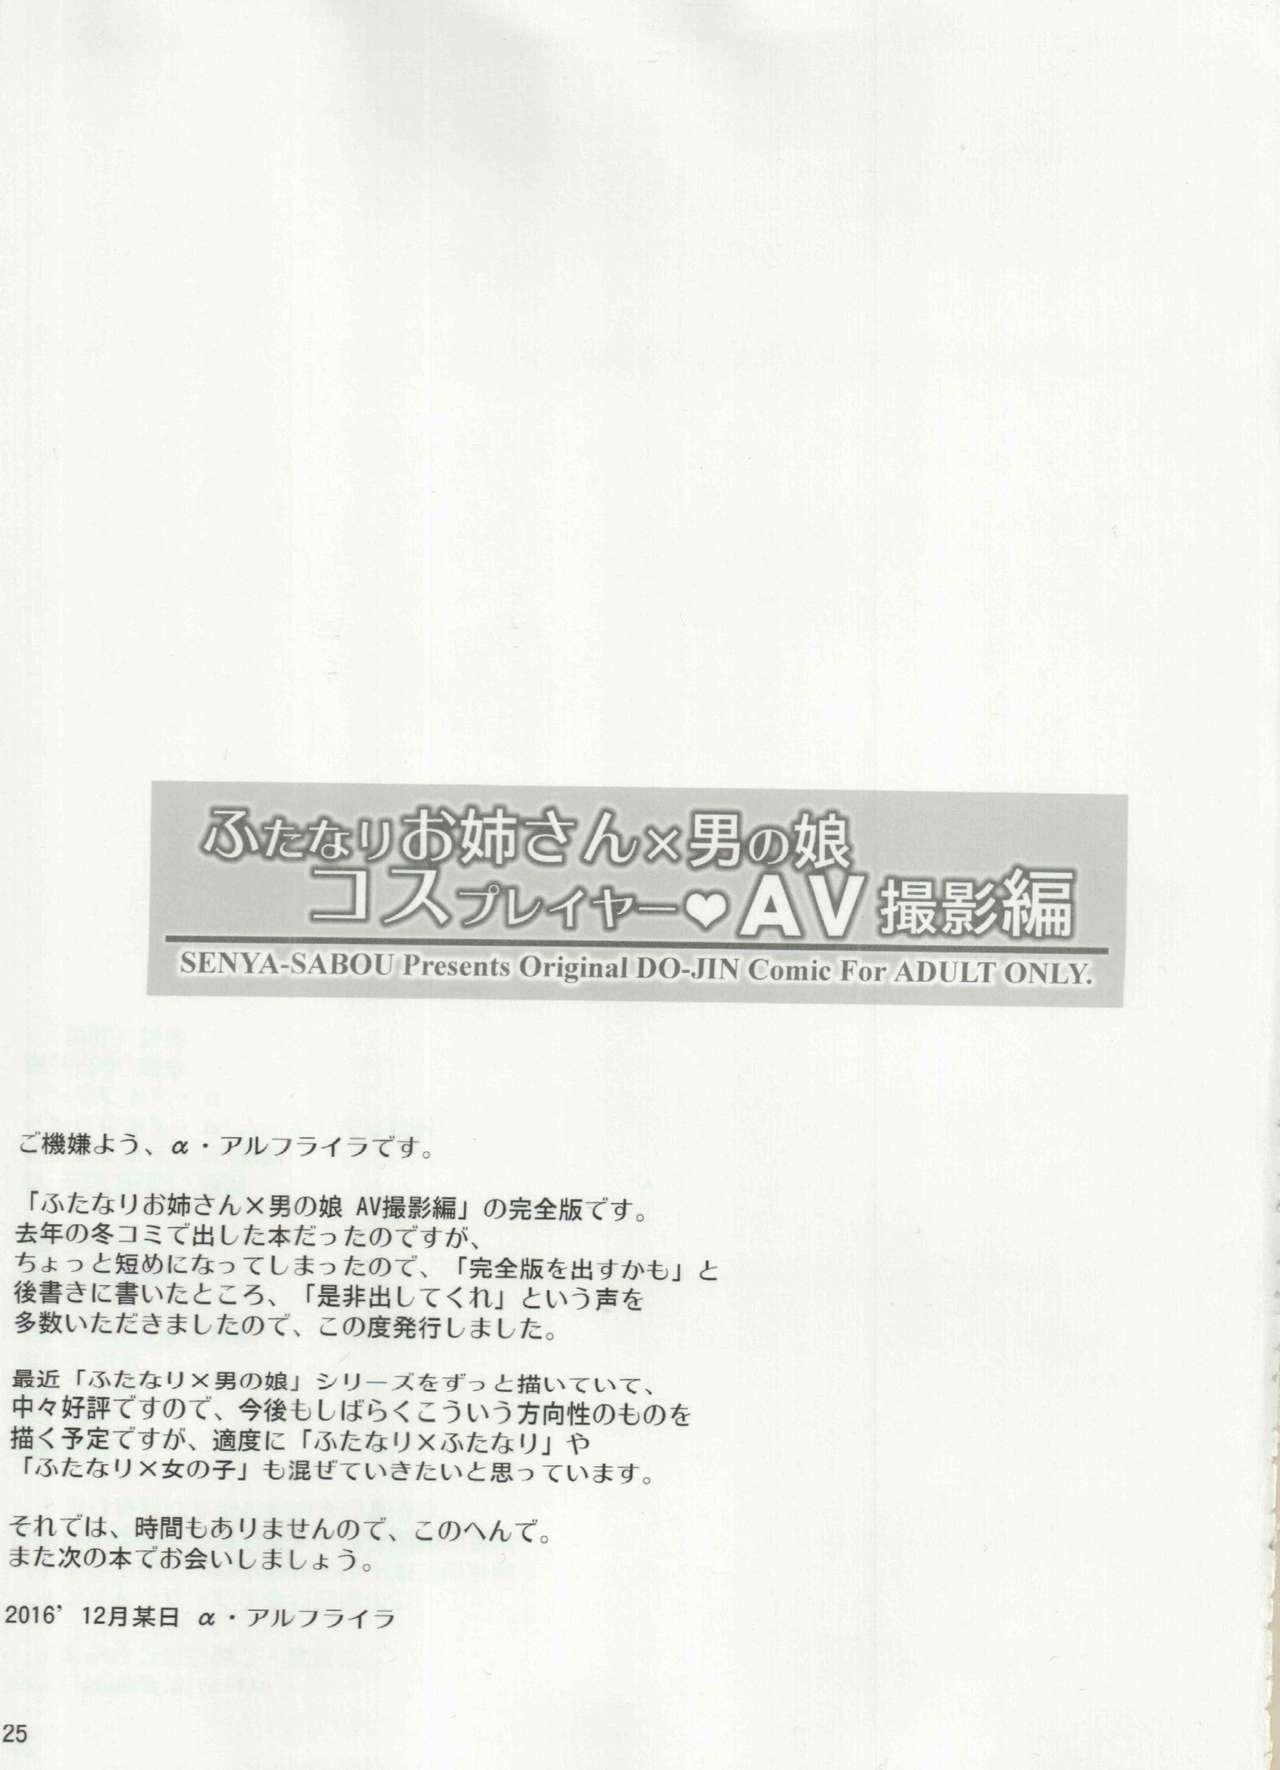 Futanari Onee-san x Otokonoko Cosplayer AV Satsuei Hen Kanzenban 23